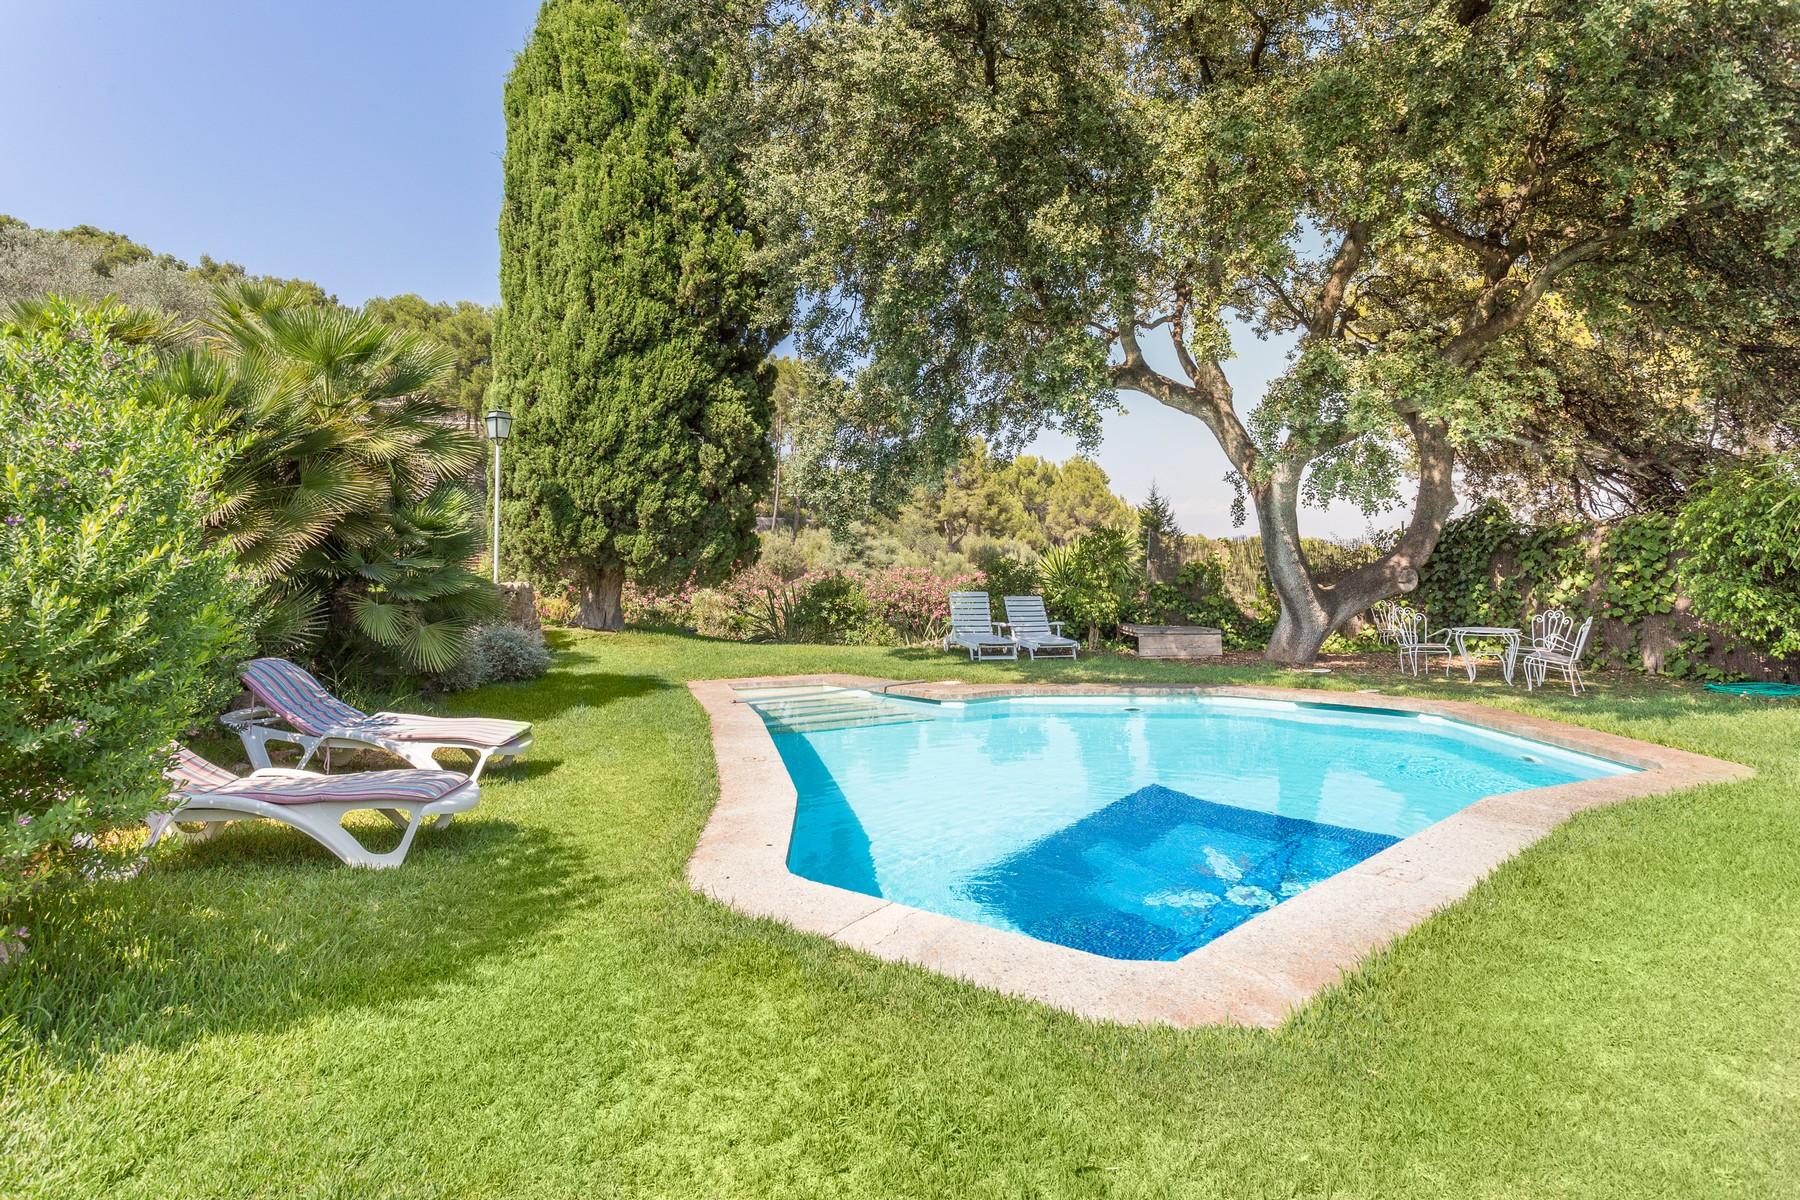 Single Family Home for Sale at Grand Villa with swimming pool in Son Vida Palma, Mallorca 07013 Spain